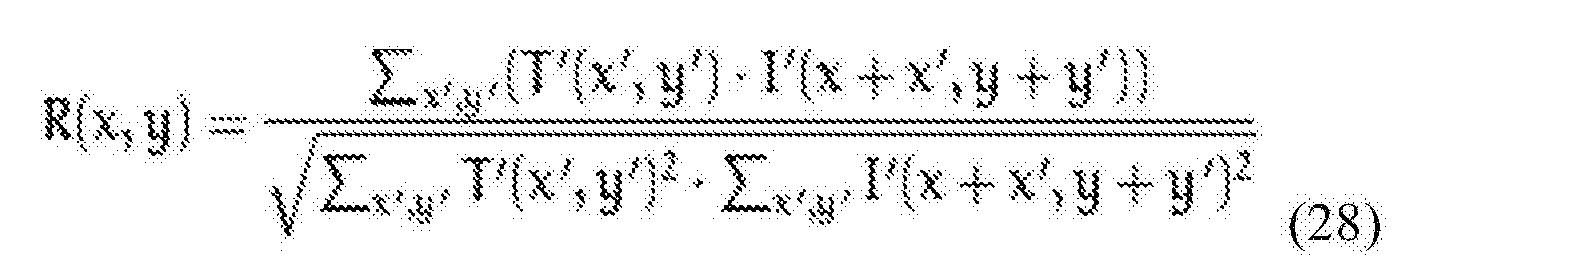 Figure CN107303402AD00513